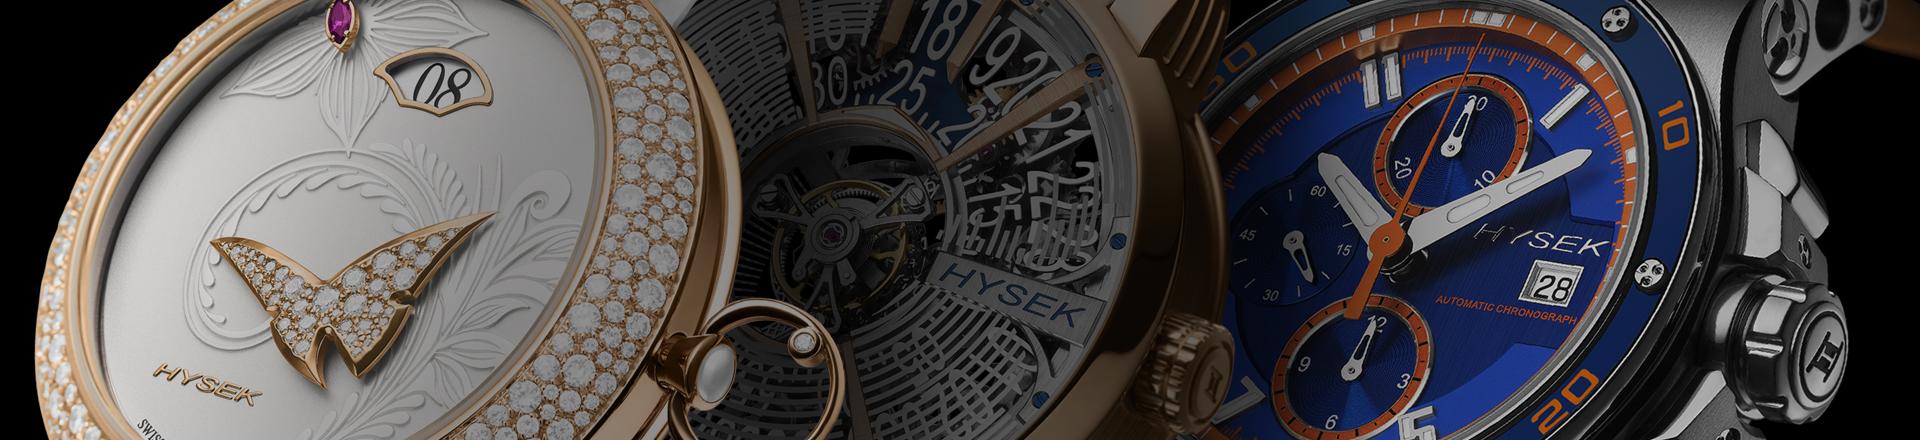 hysek watches